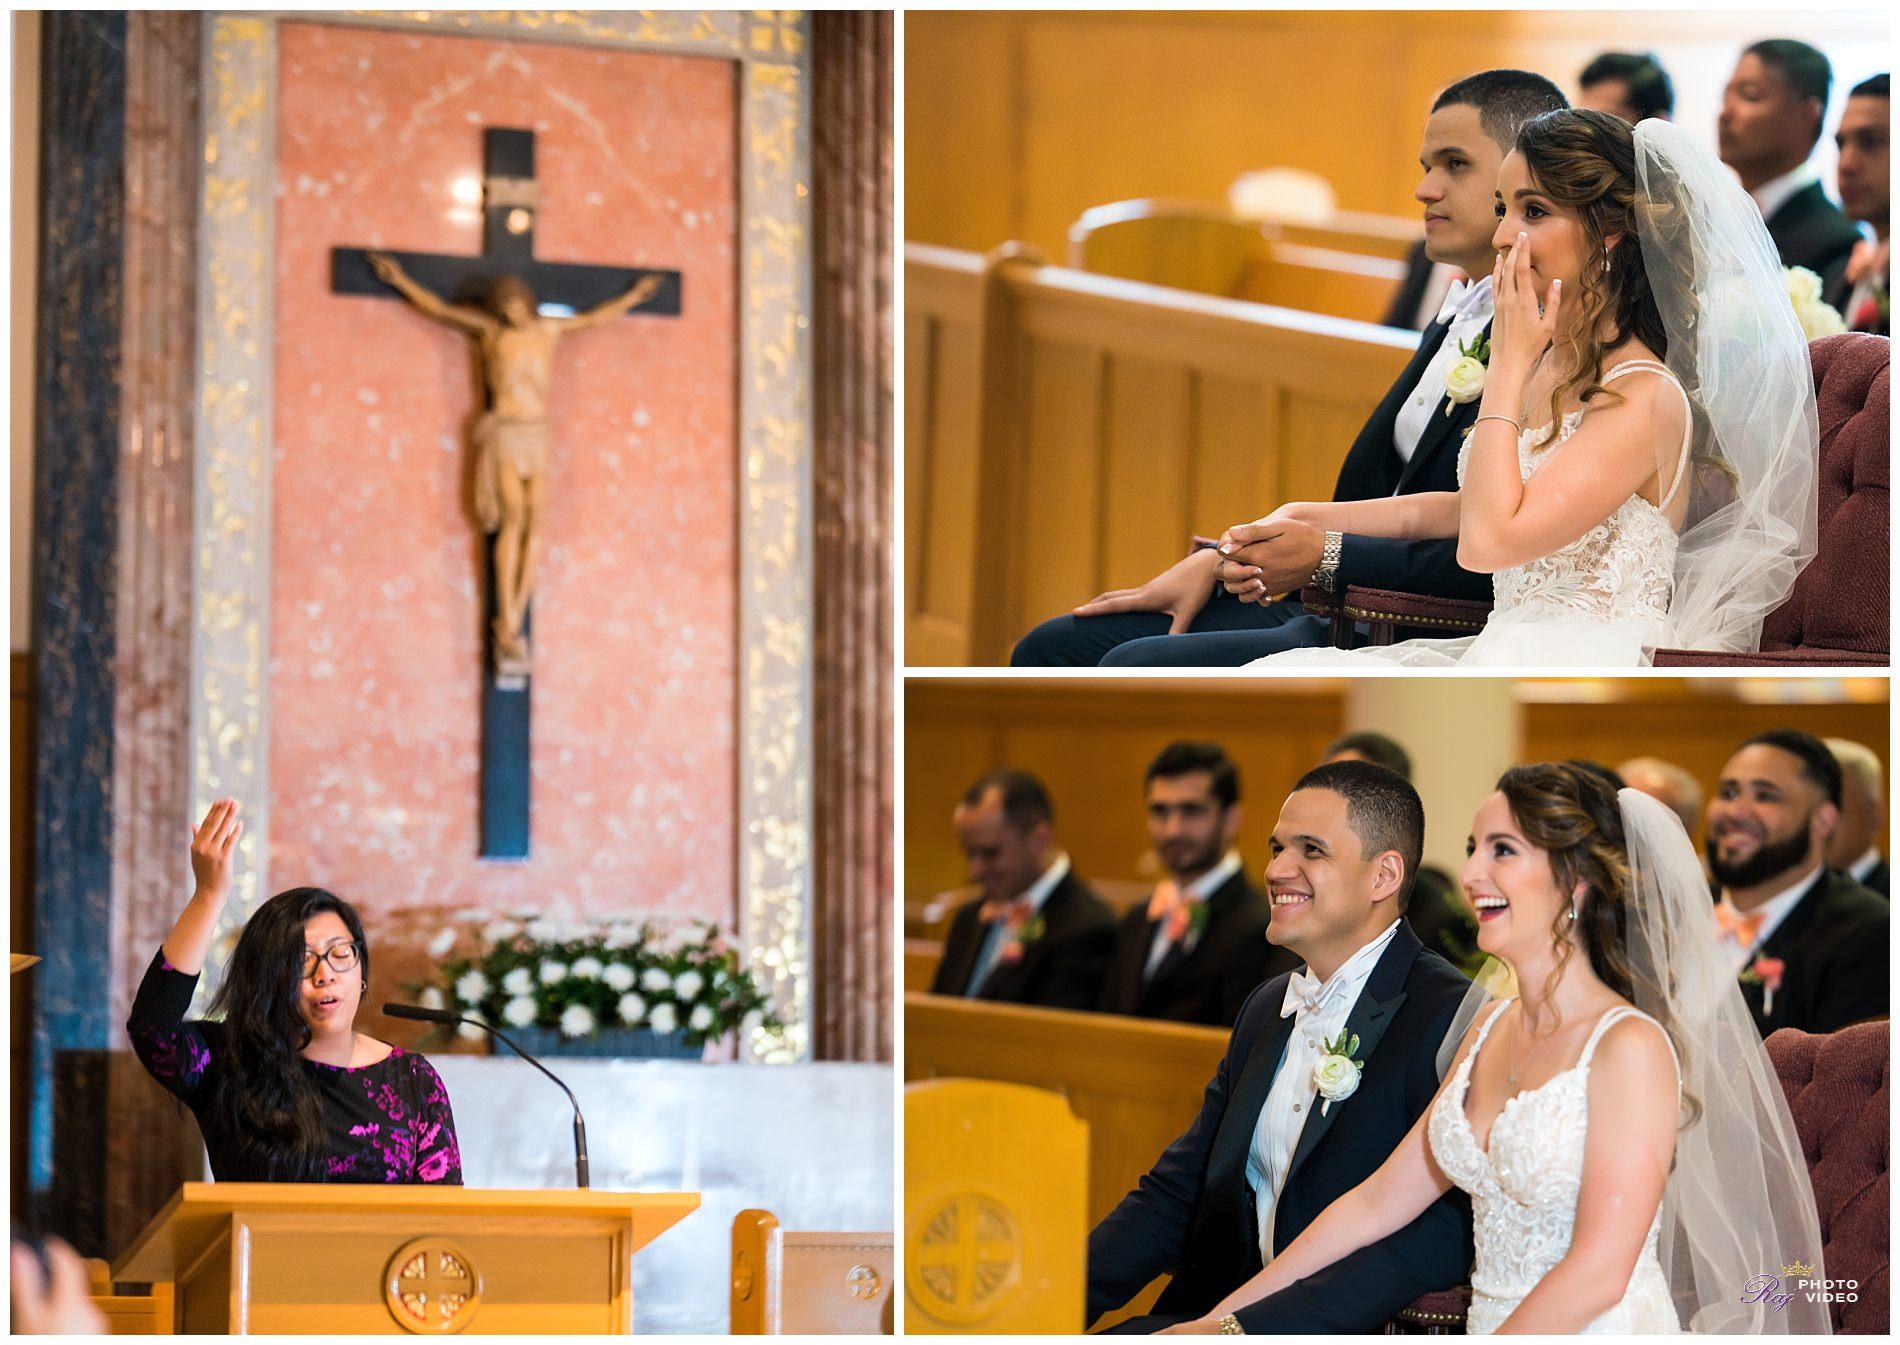 St-Valentines-Catholic-Church-Bloomfield-NJ-Wedding-Yanet-Jose-8.jpg